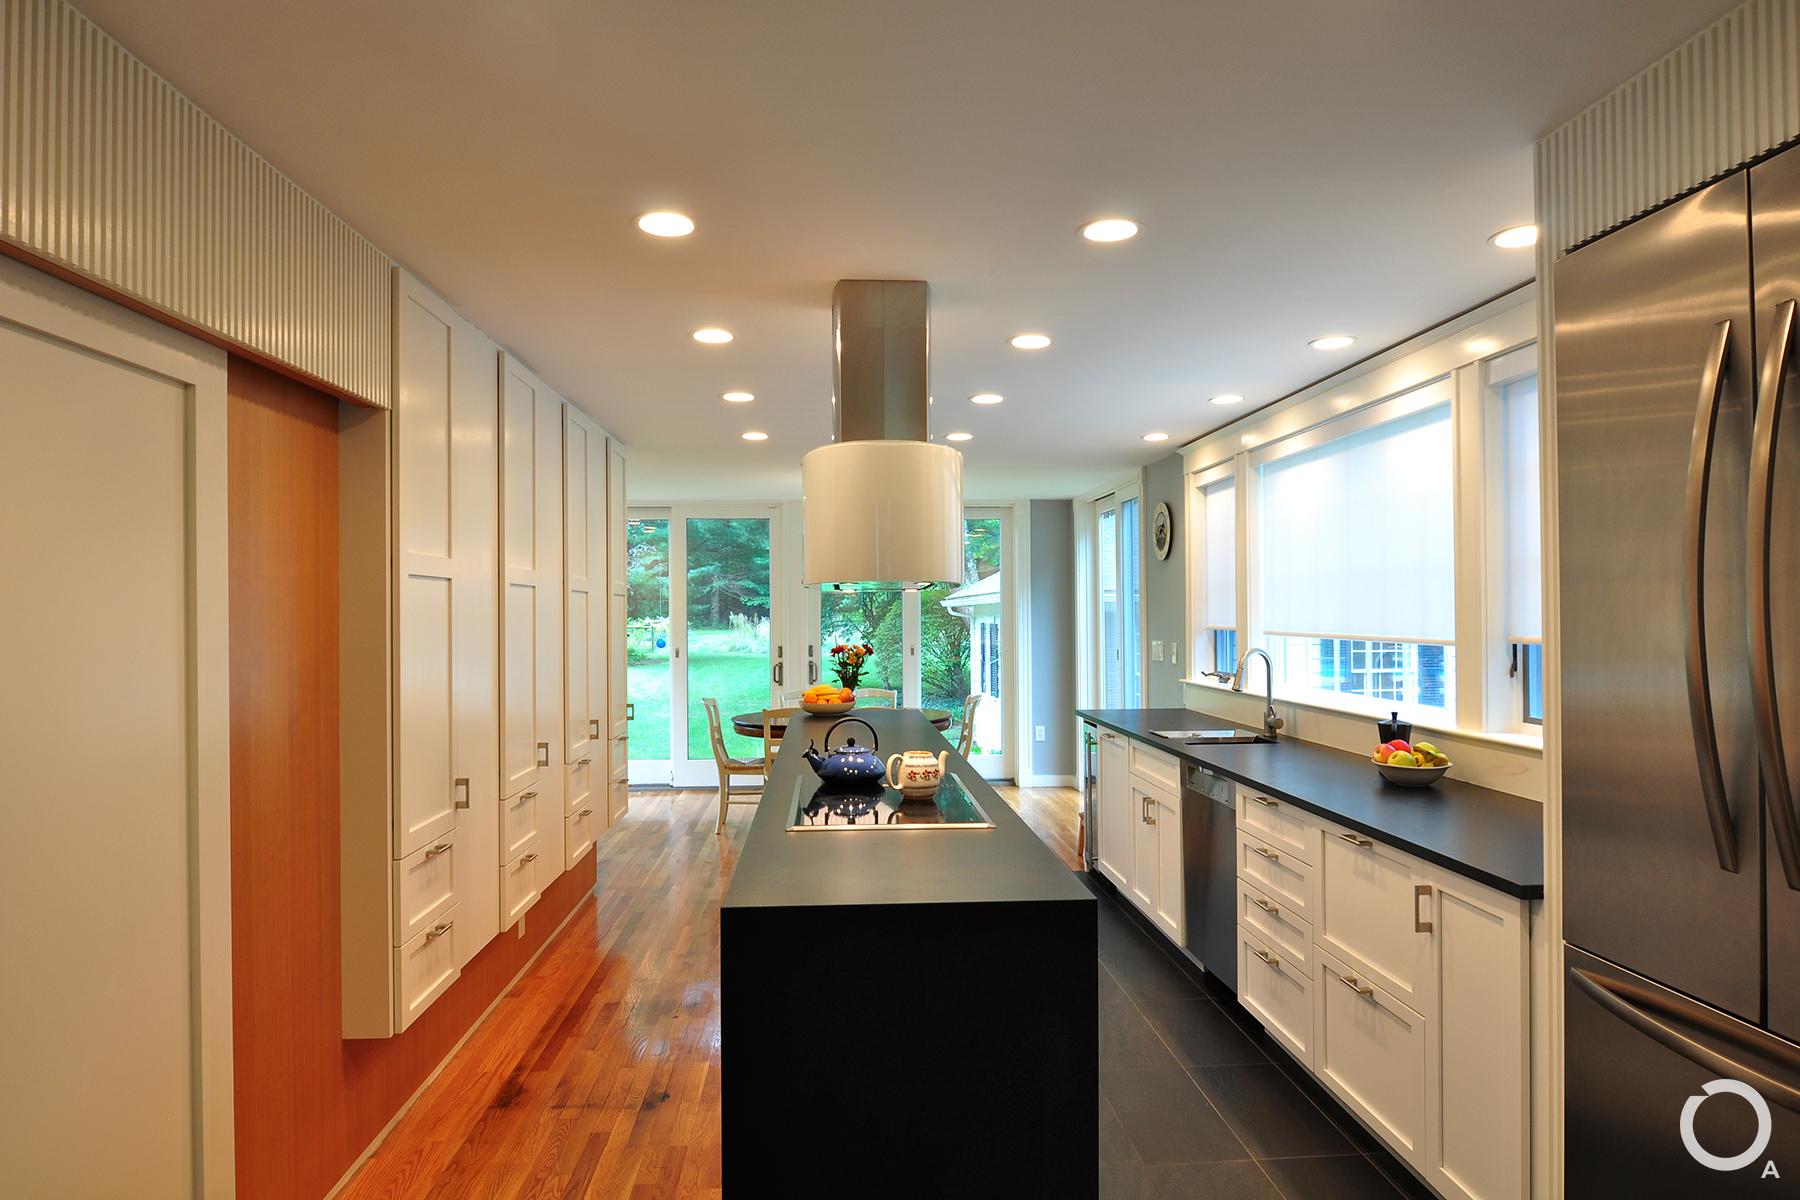 B1 (Dover Home Addition Boston Architect Interior Designer).jpg